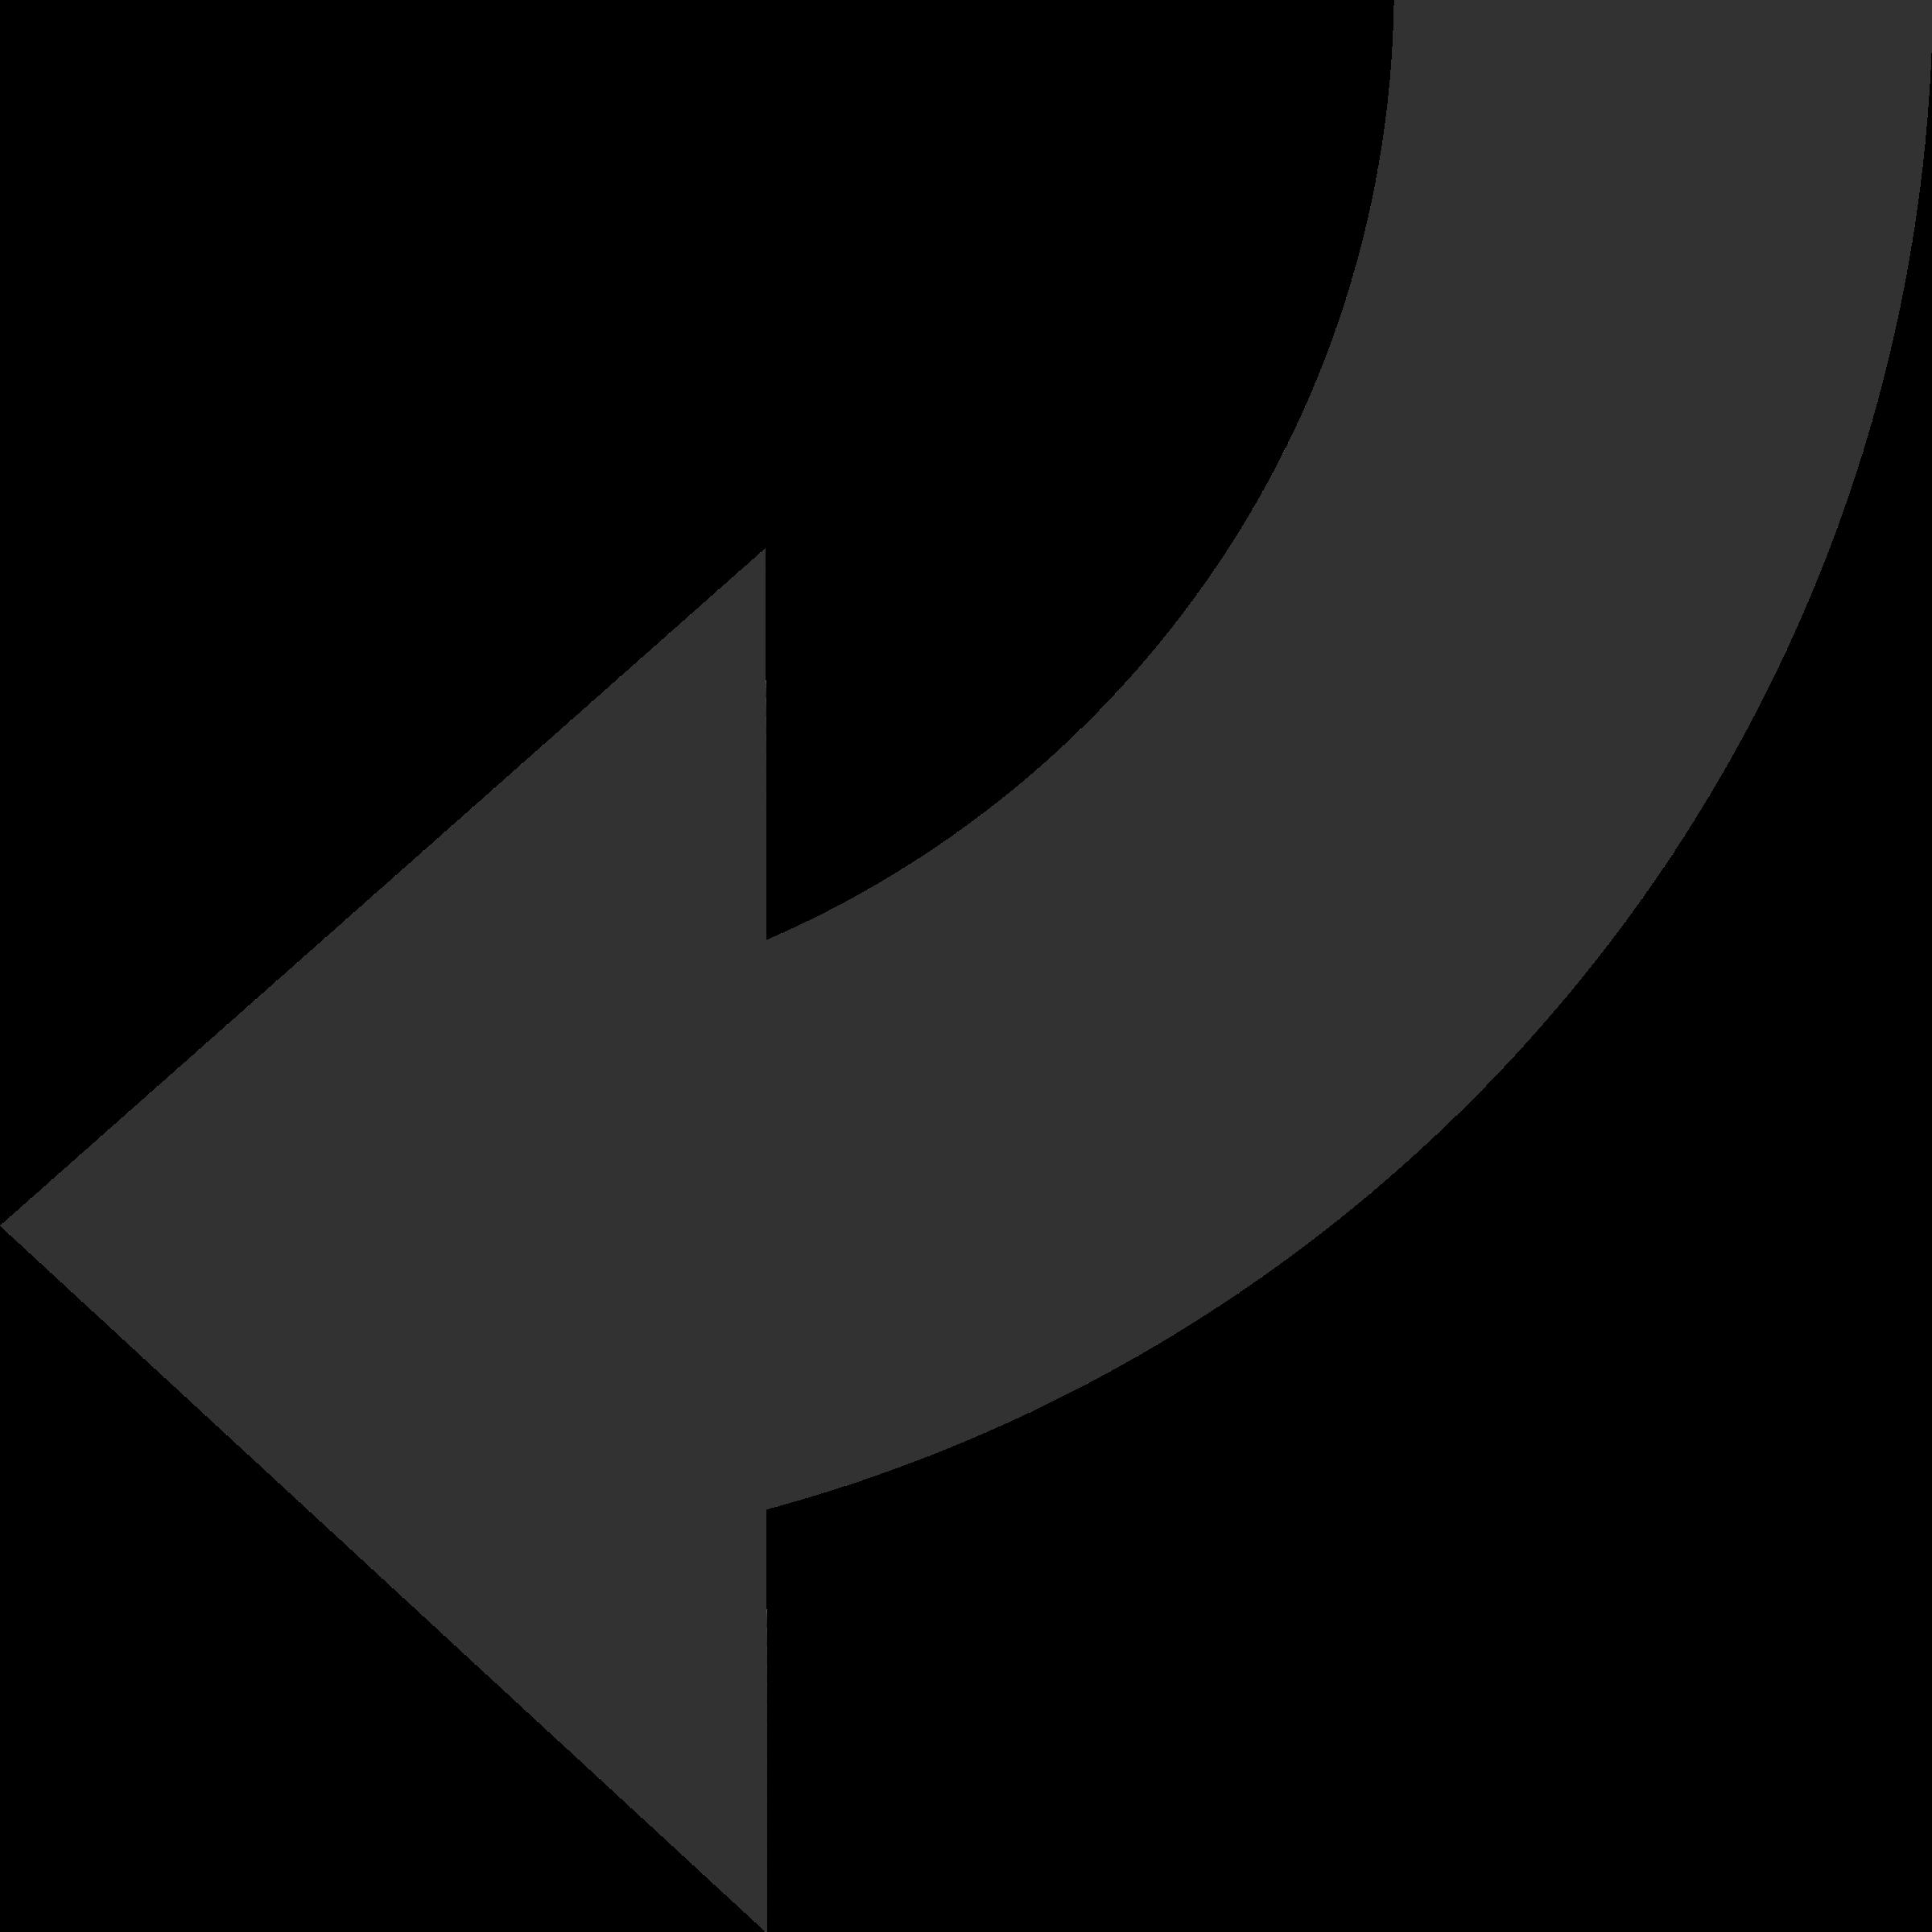 Left arrow clip art svg black and white stock Clipart - Rotate Arrow Top to Left svg black and white stock